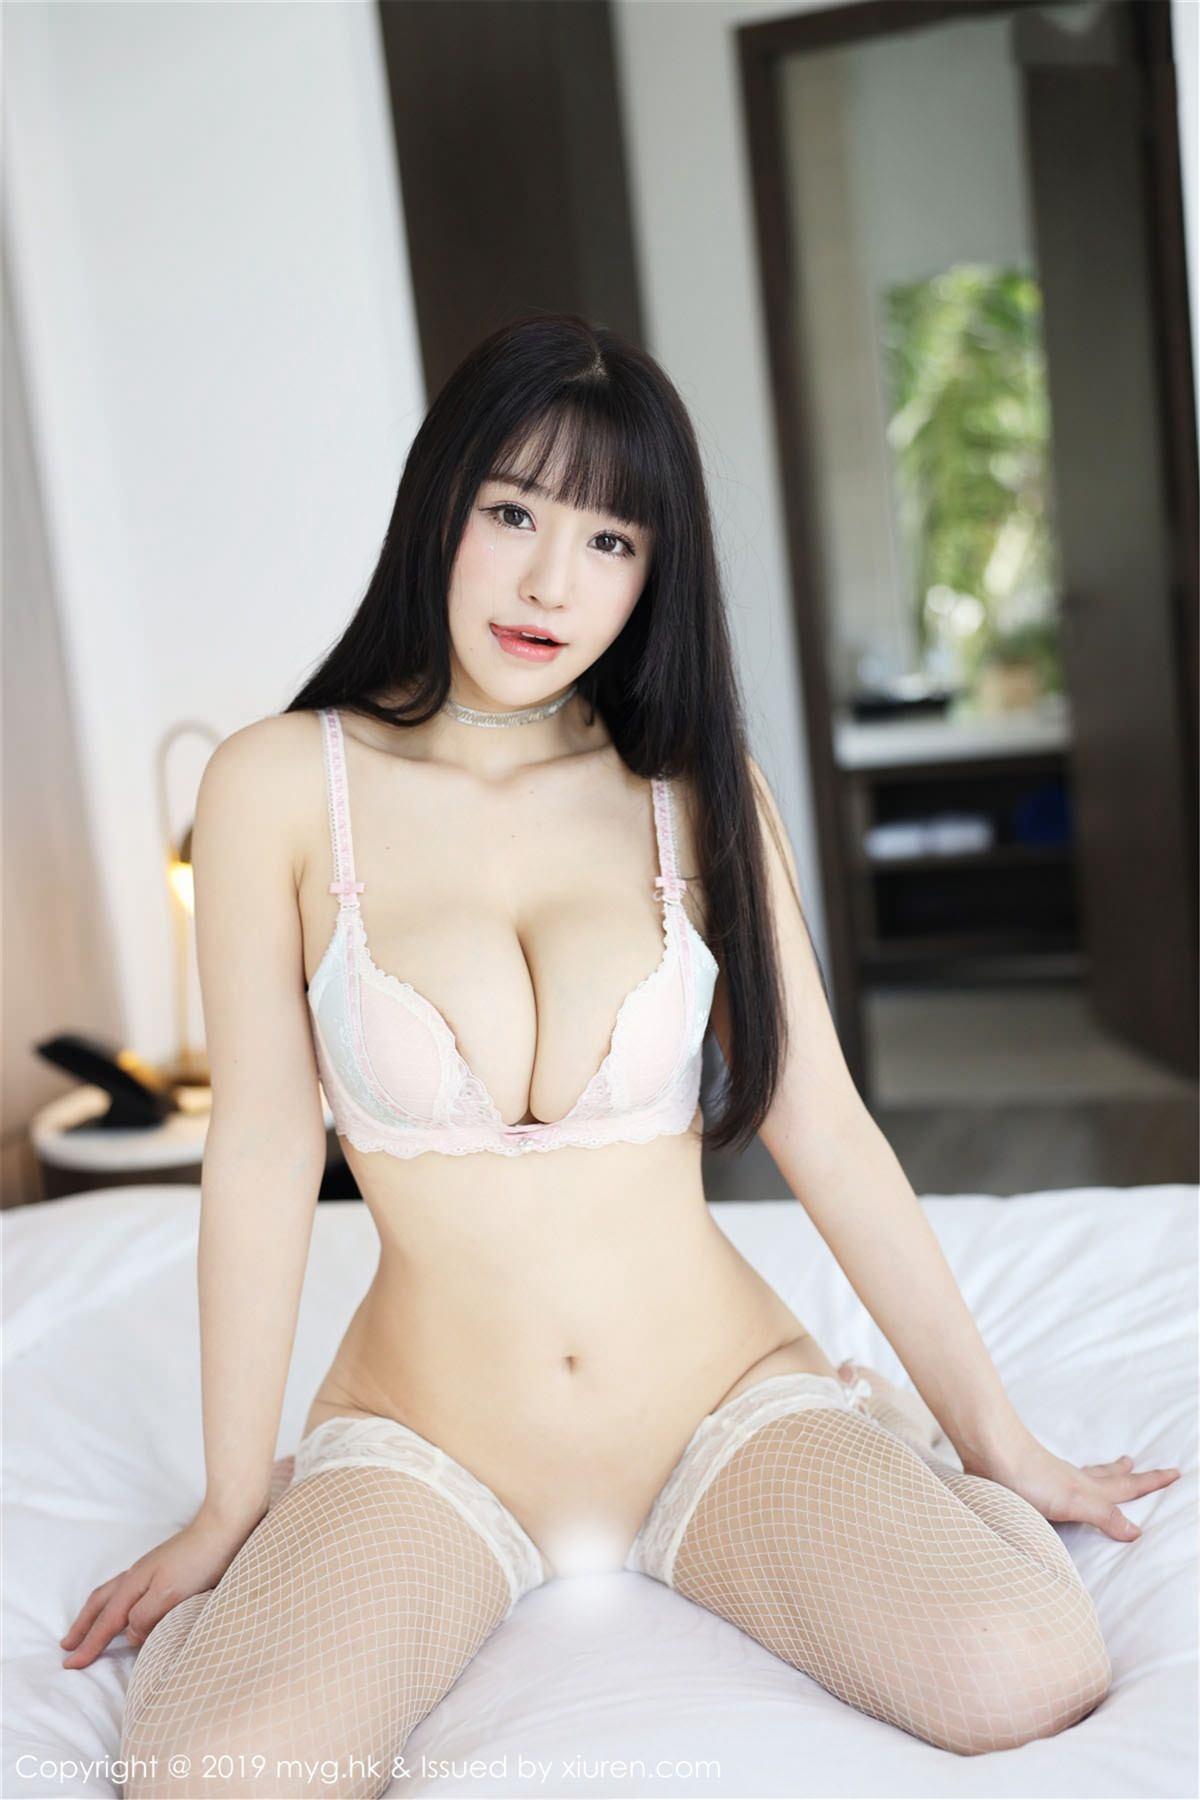 MyGirl Vol.364 26P, mygirl, Zhu Ke Er